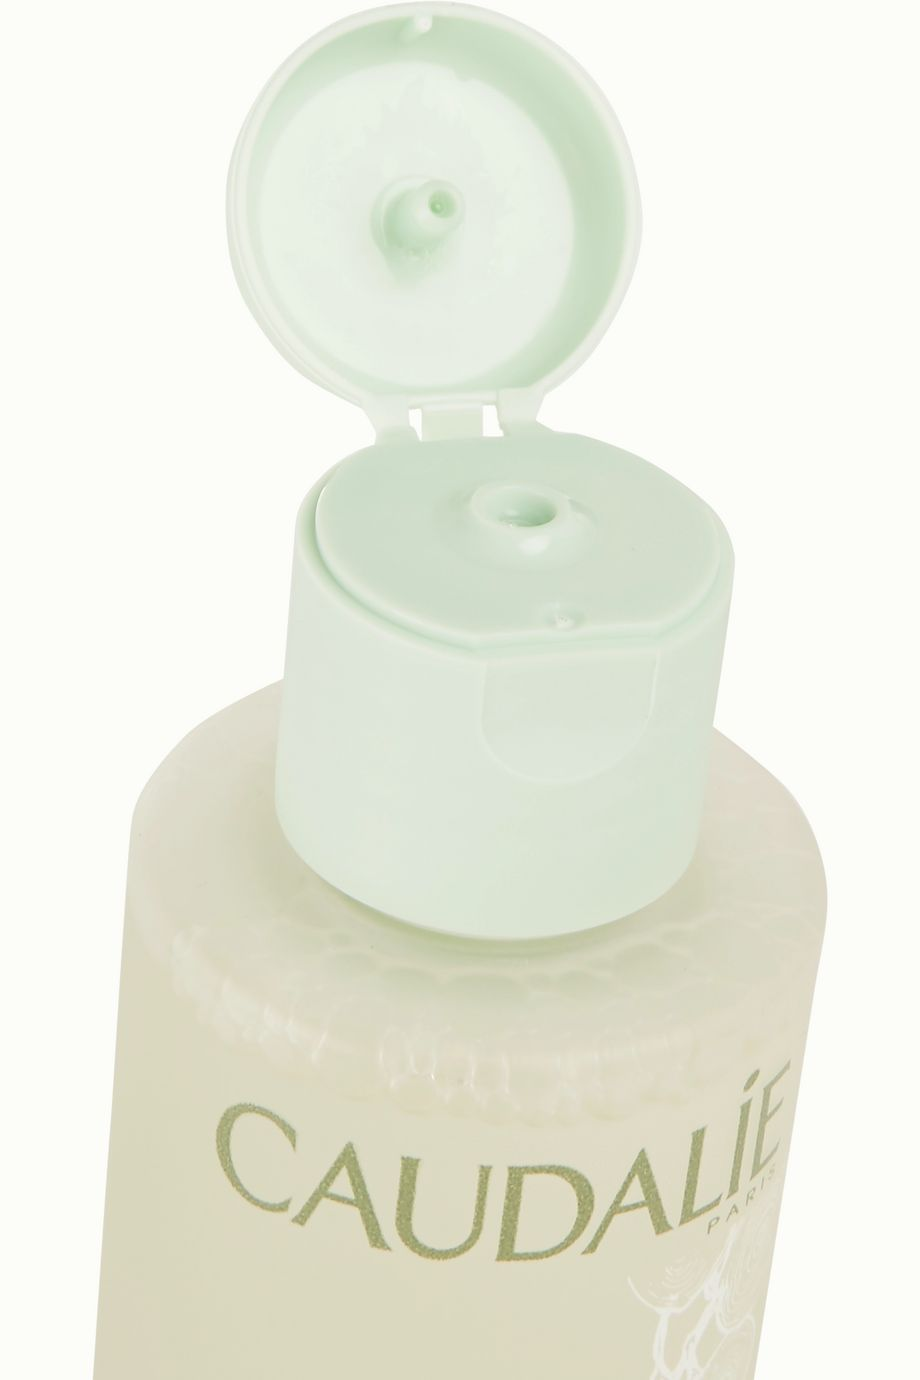 Caudalie Vinopure Clear Skin Purifying Toner, 200ml